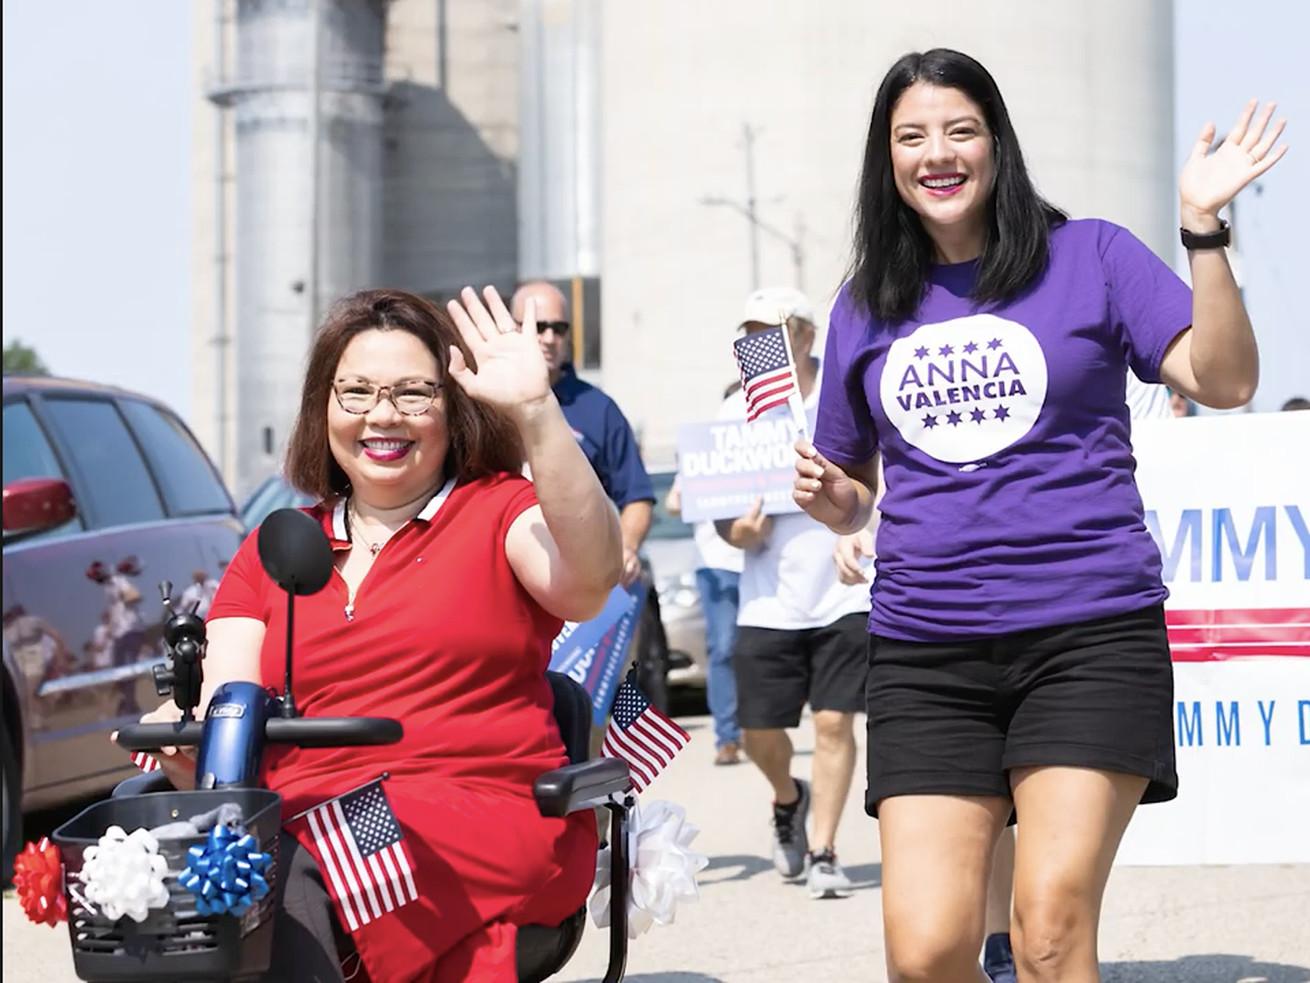 Sen. Tammy Duckworth backs Chicago City Clerk Anna Valencia for Illinois Secretary of State.